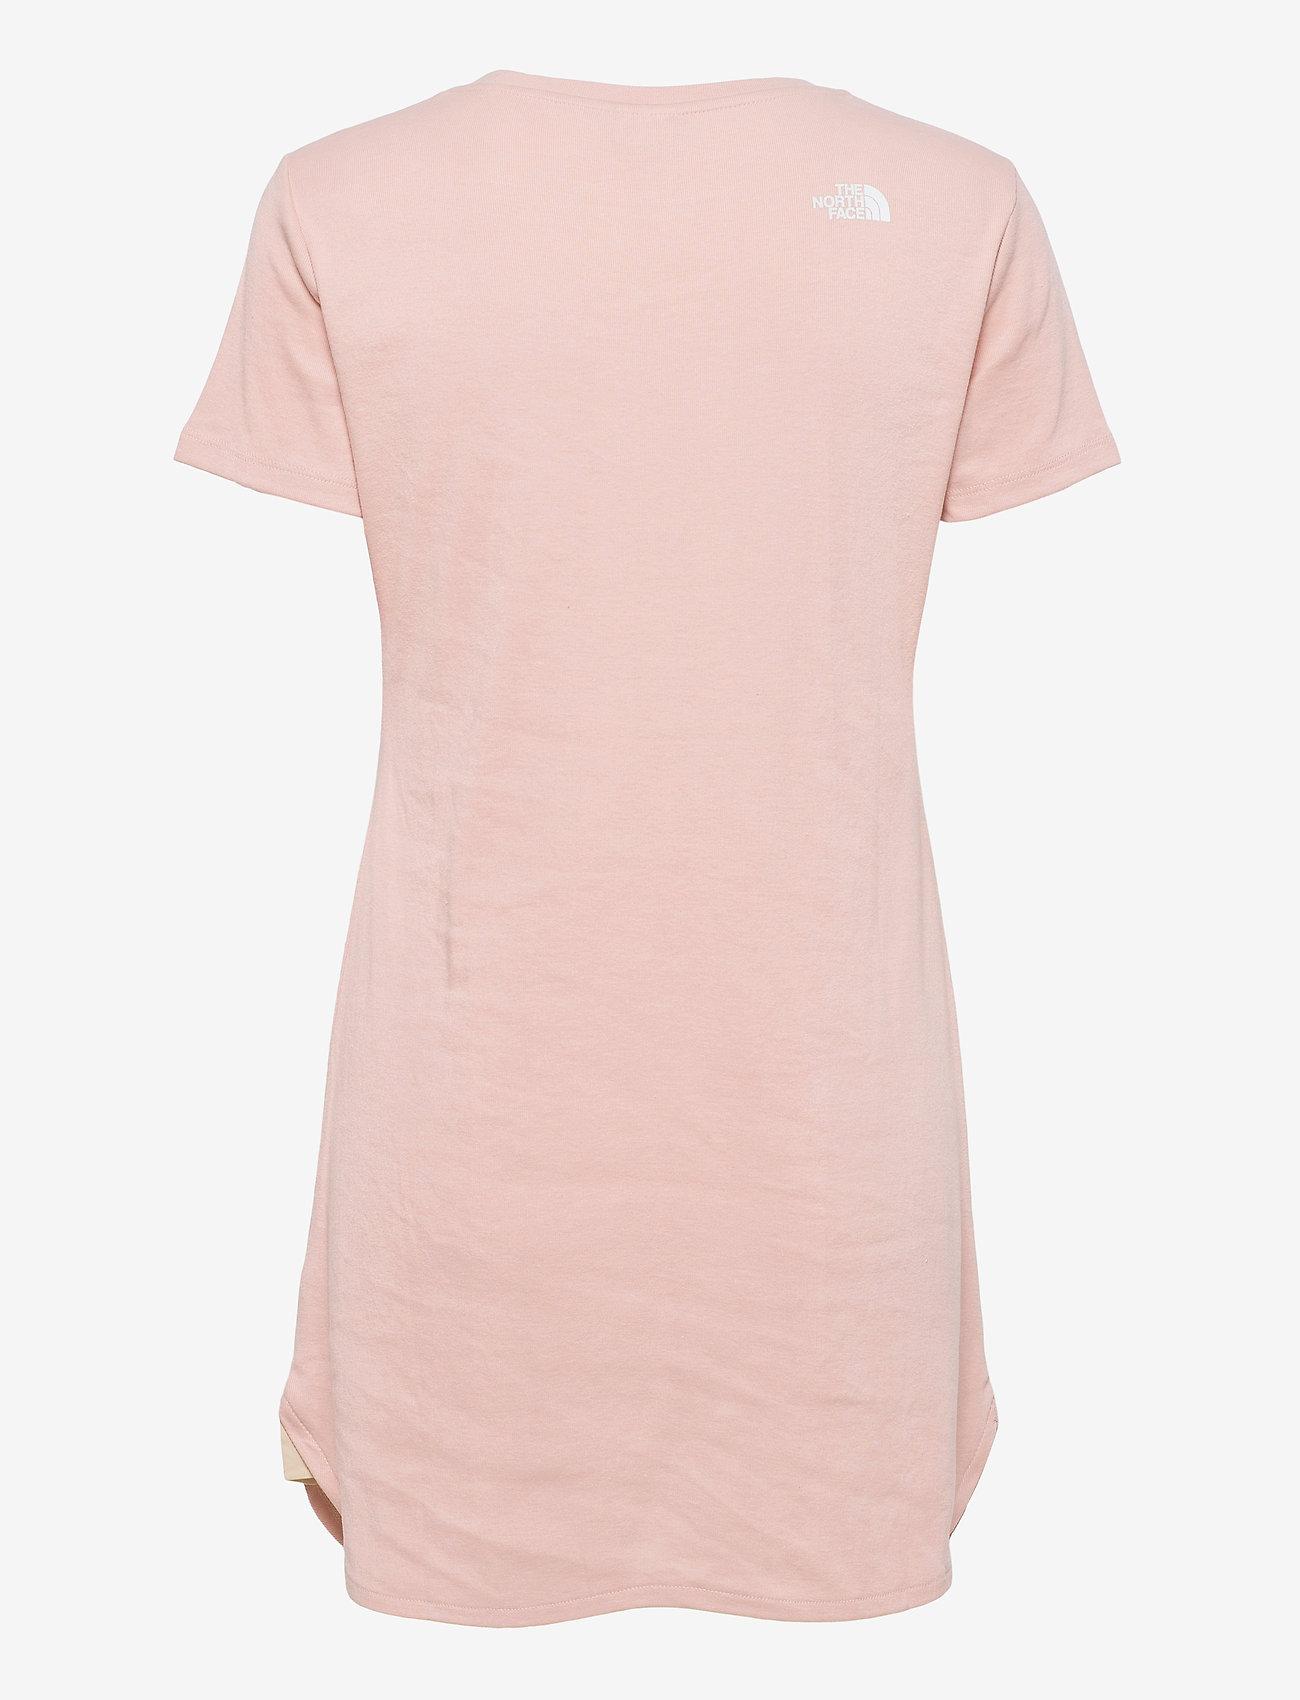 The North Face - W SIMPLE DM DRESS - t-shirtkjoler - evening sand pink - 1